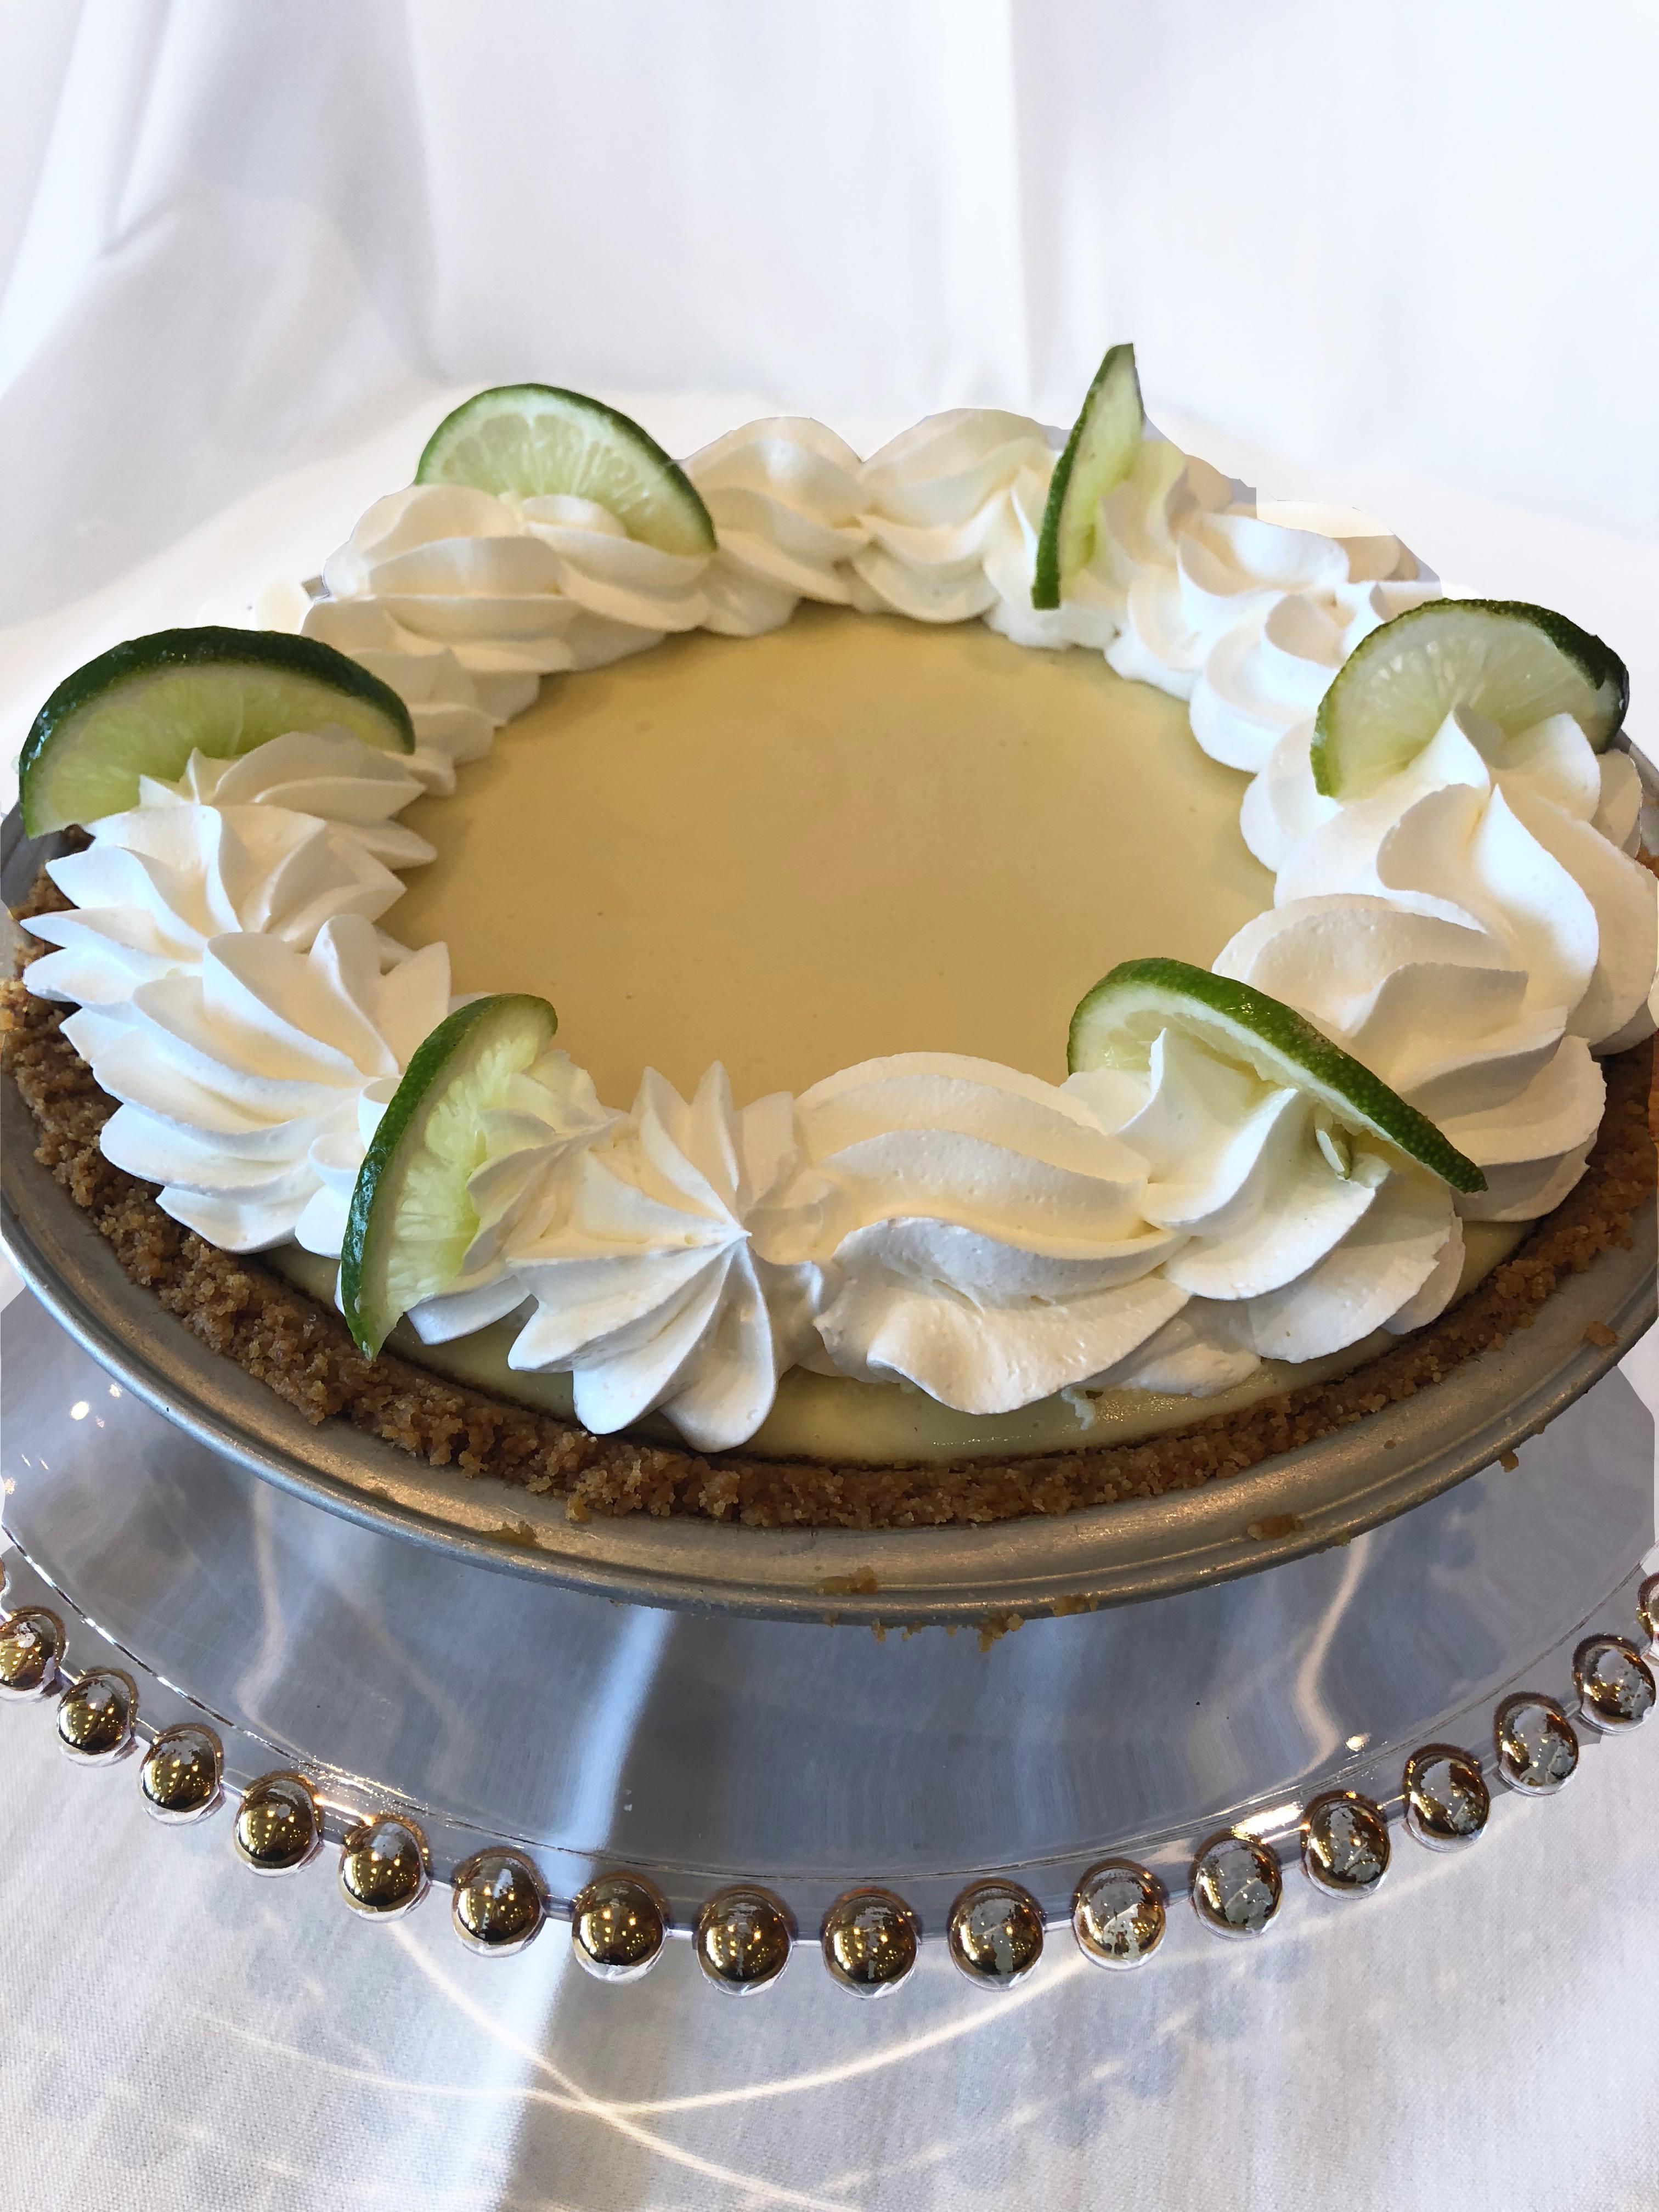 Whole Key Lime Pie Image